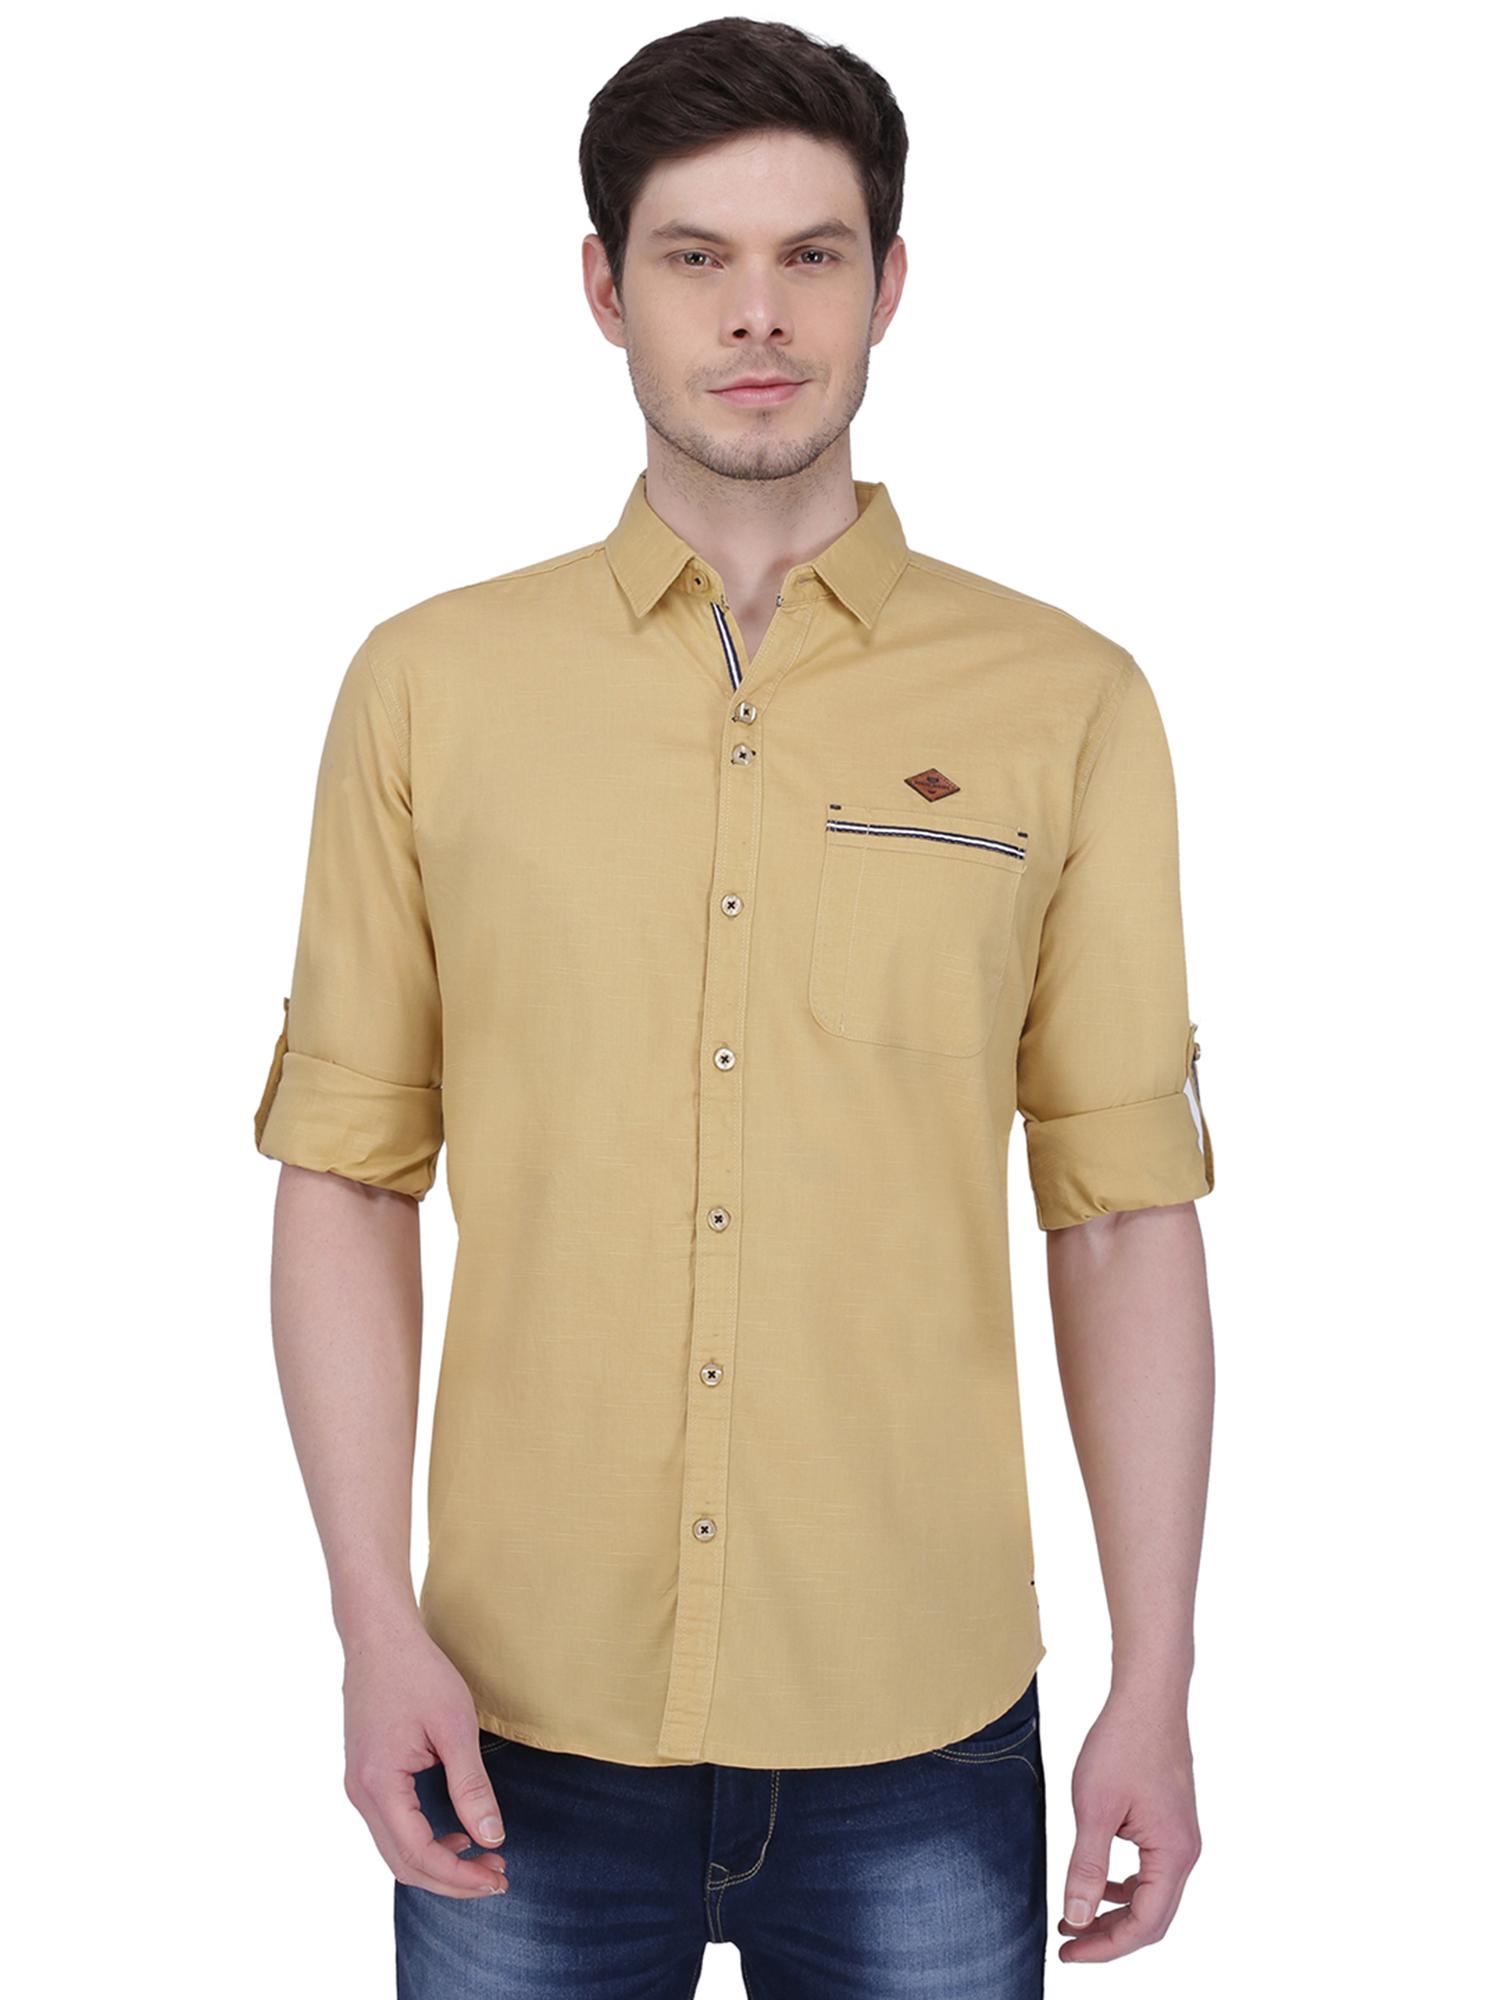 Kuons Avenue | Kuons Avenue Men's Beige Khaki Linen Cotton Shirt- KACLFS1304BE